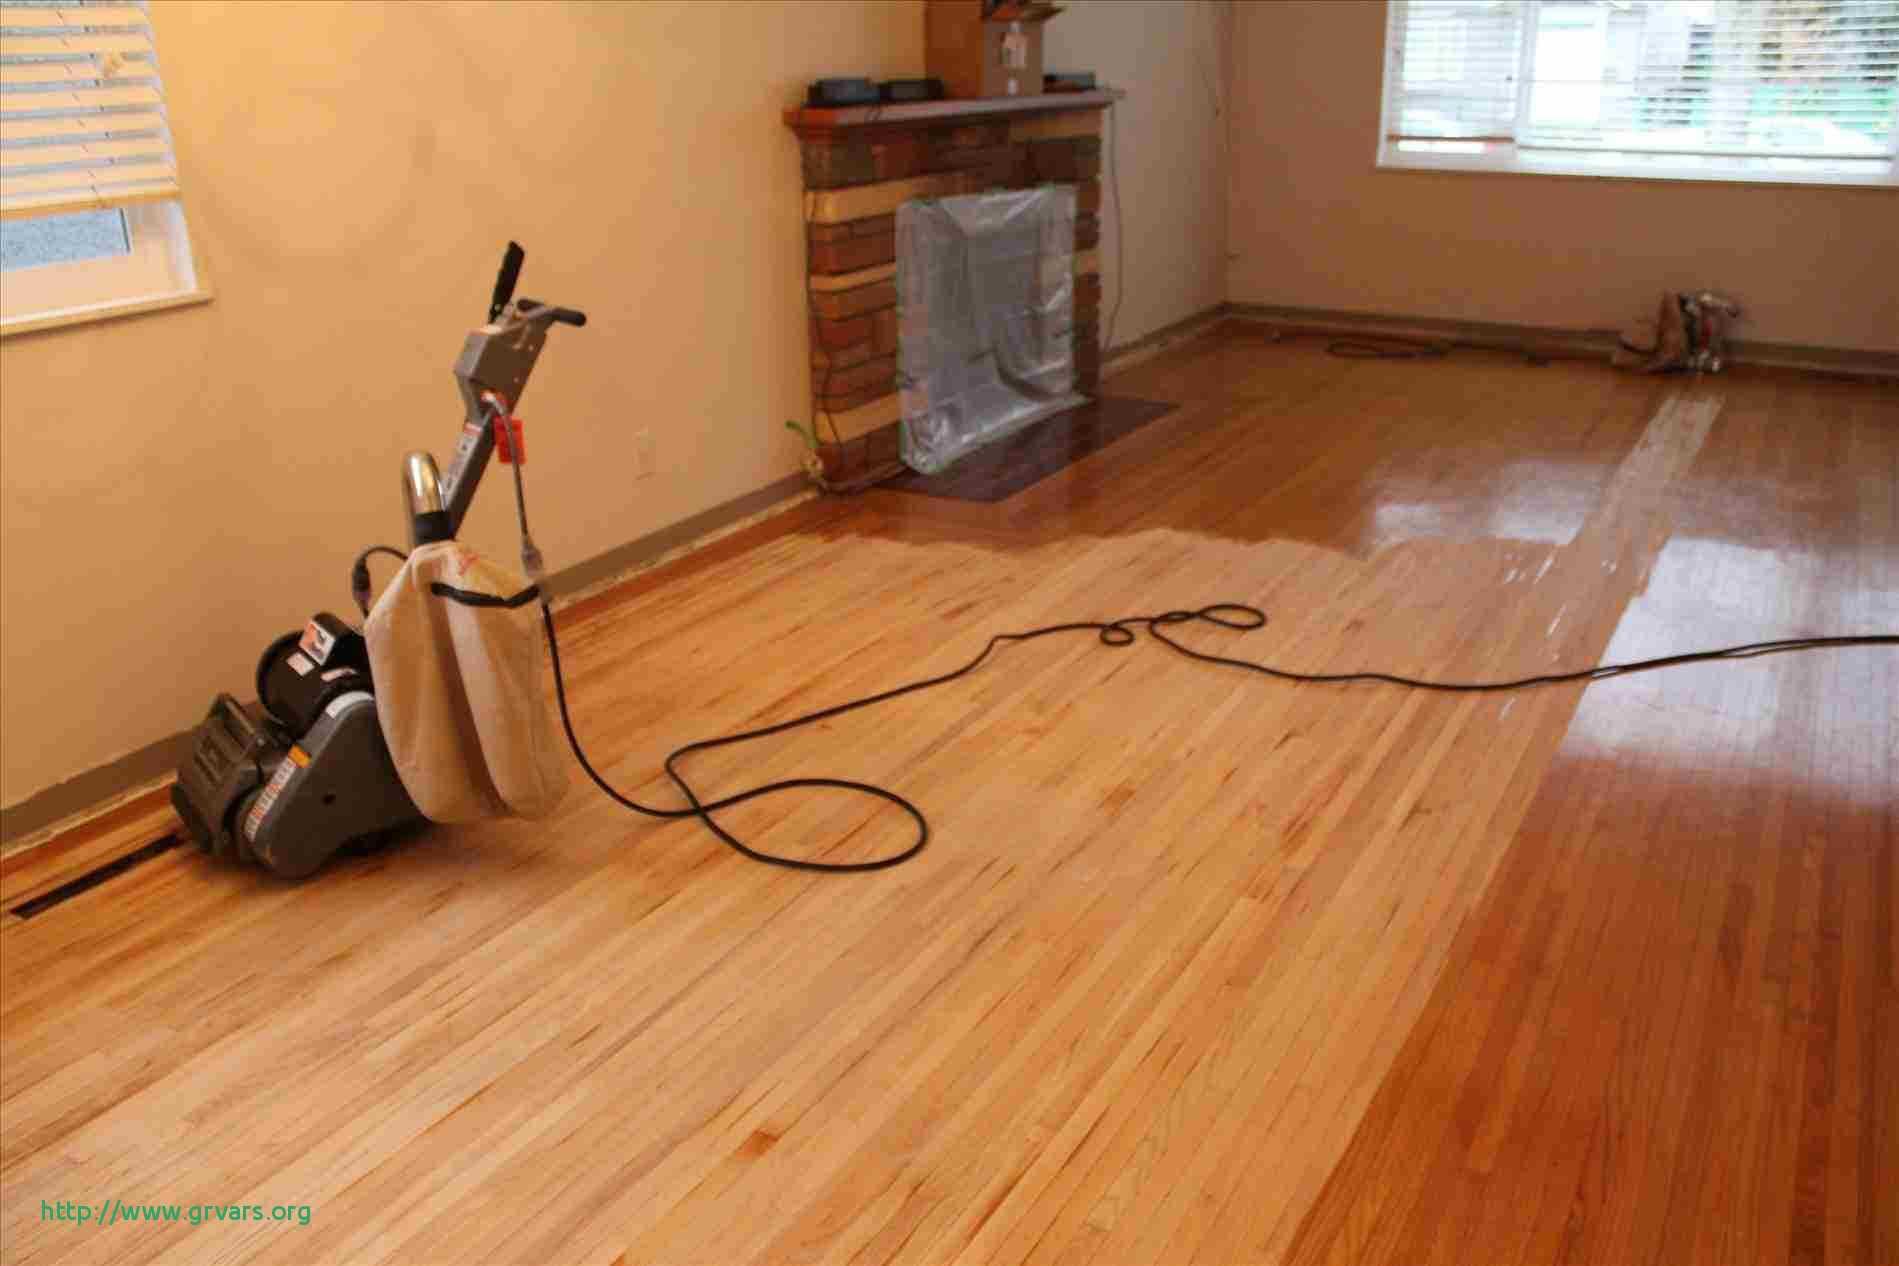 hardwood floor refinishing equipment rental of 24 nouveau does lowes rent floor sanders ideas blog in floor sander clipart